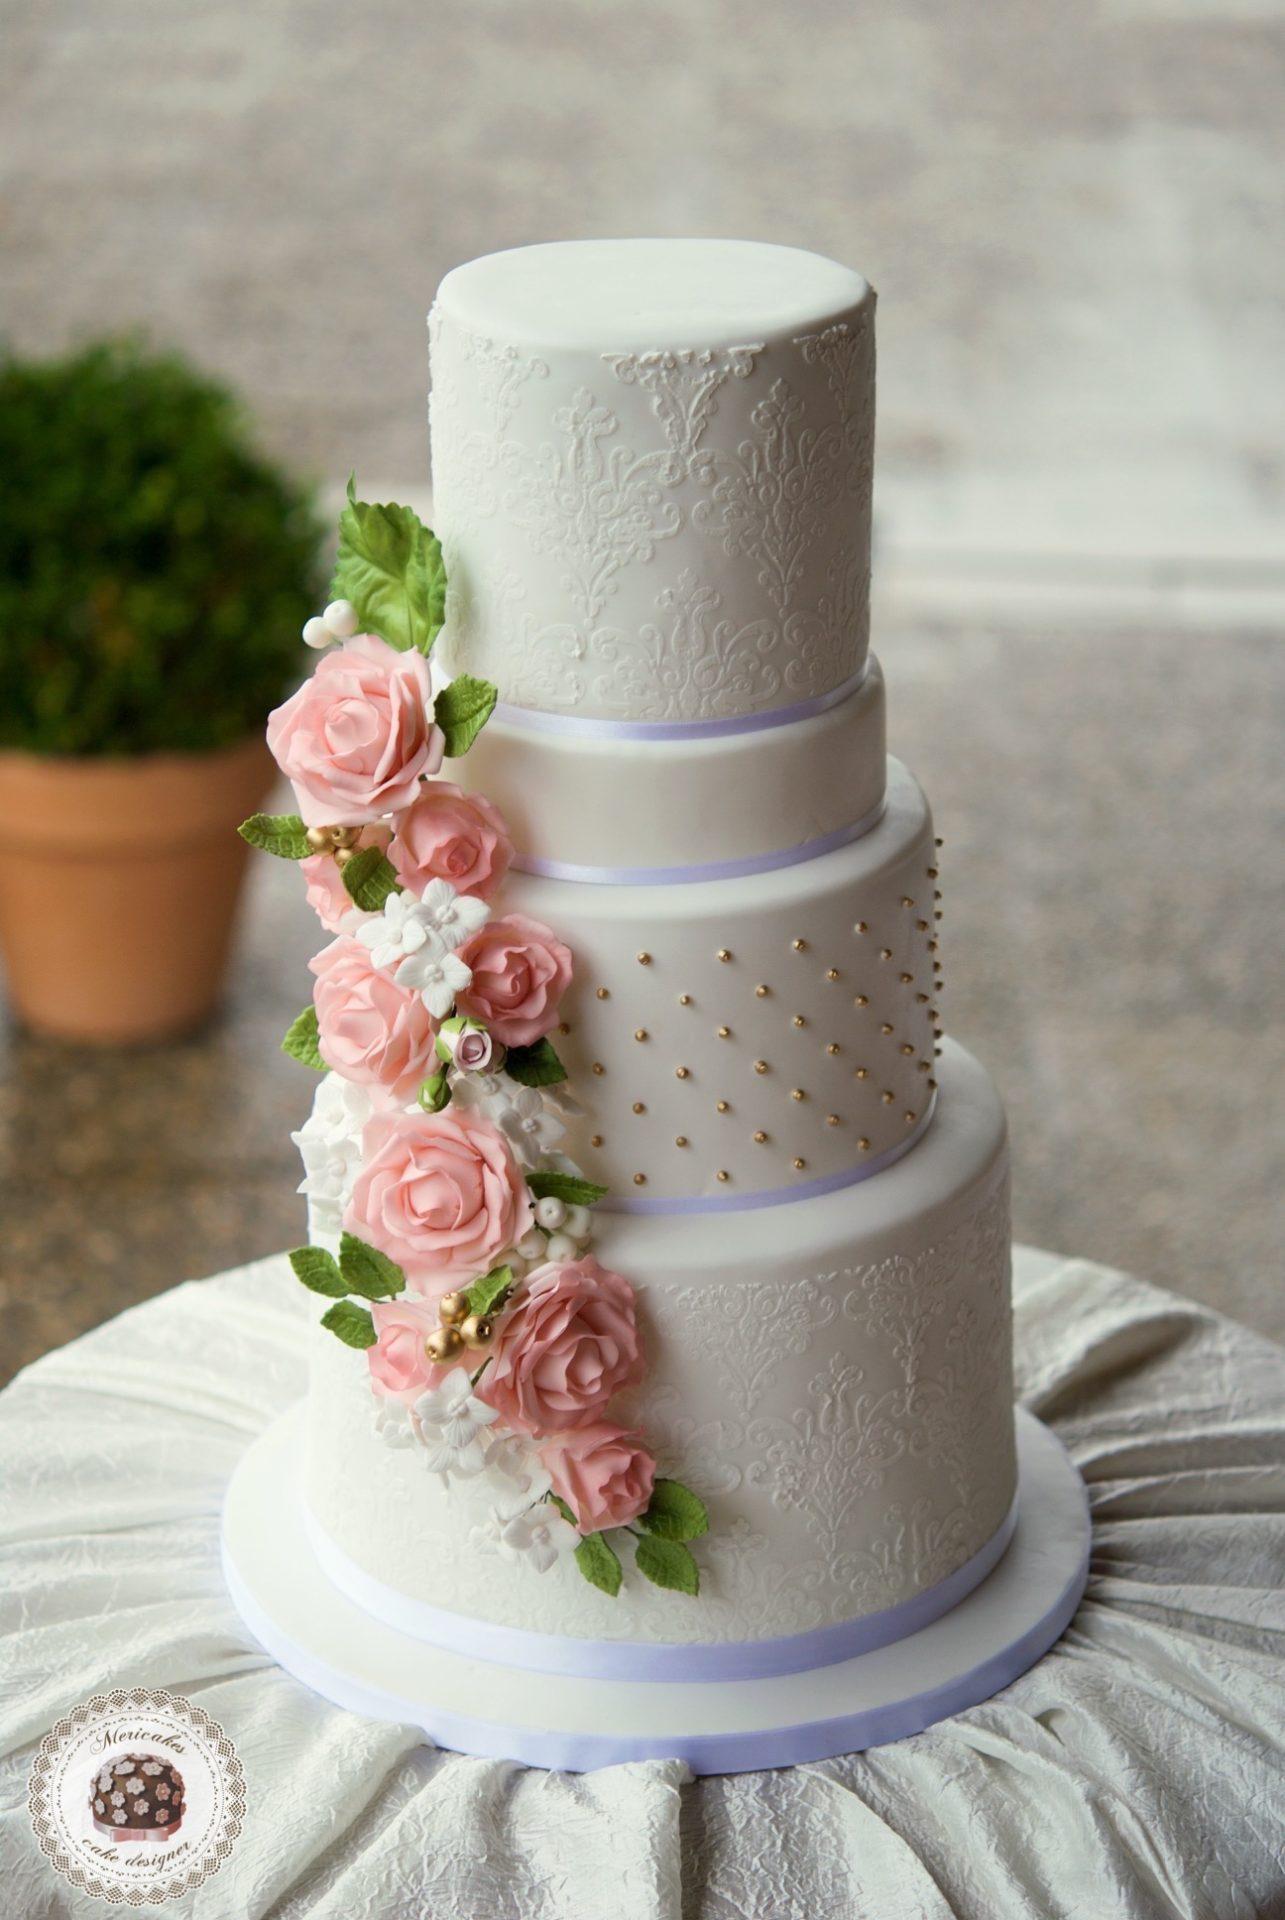 WEDDING CAKE, tarta de boda, cake artist, damask, sugar flowers, flores de aucar, hortensias, rosas, lemon curd, fondant, barcelona, mericakes